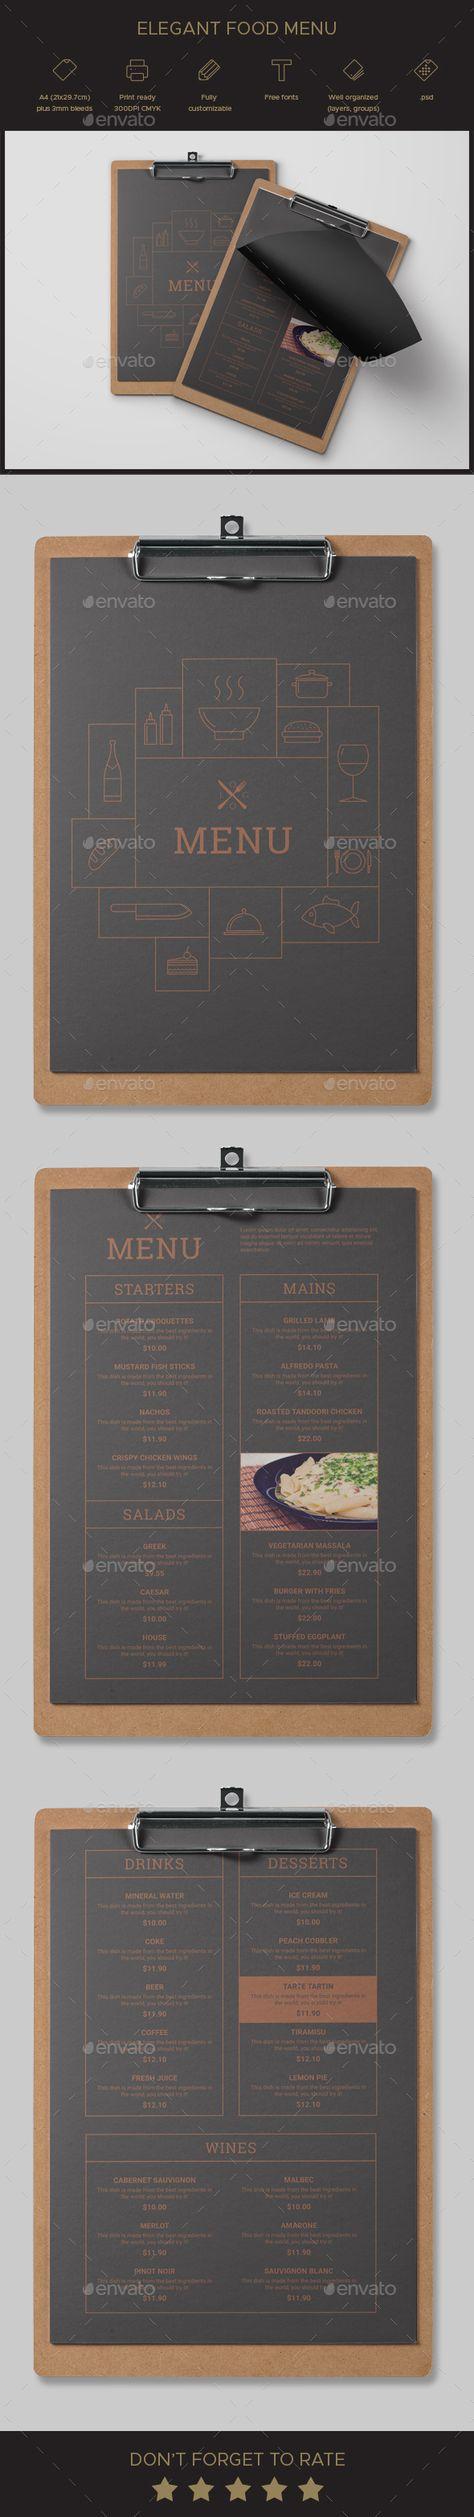 Ziemlich Elegante Menüvorlage Kostenlos Fotos - Entry Level Resume ...